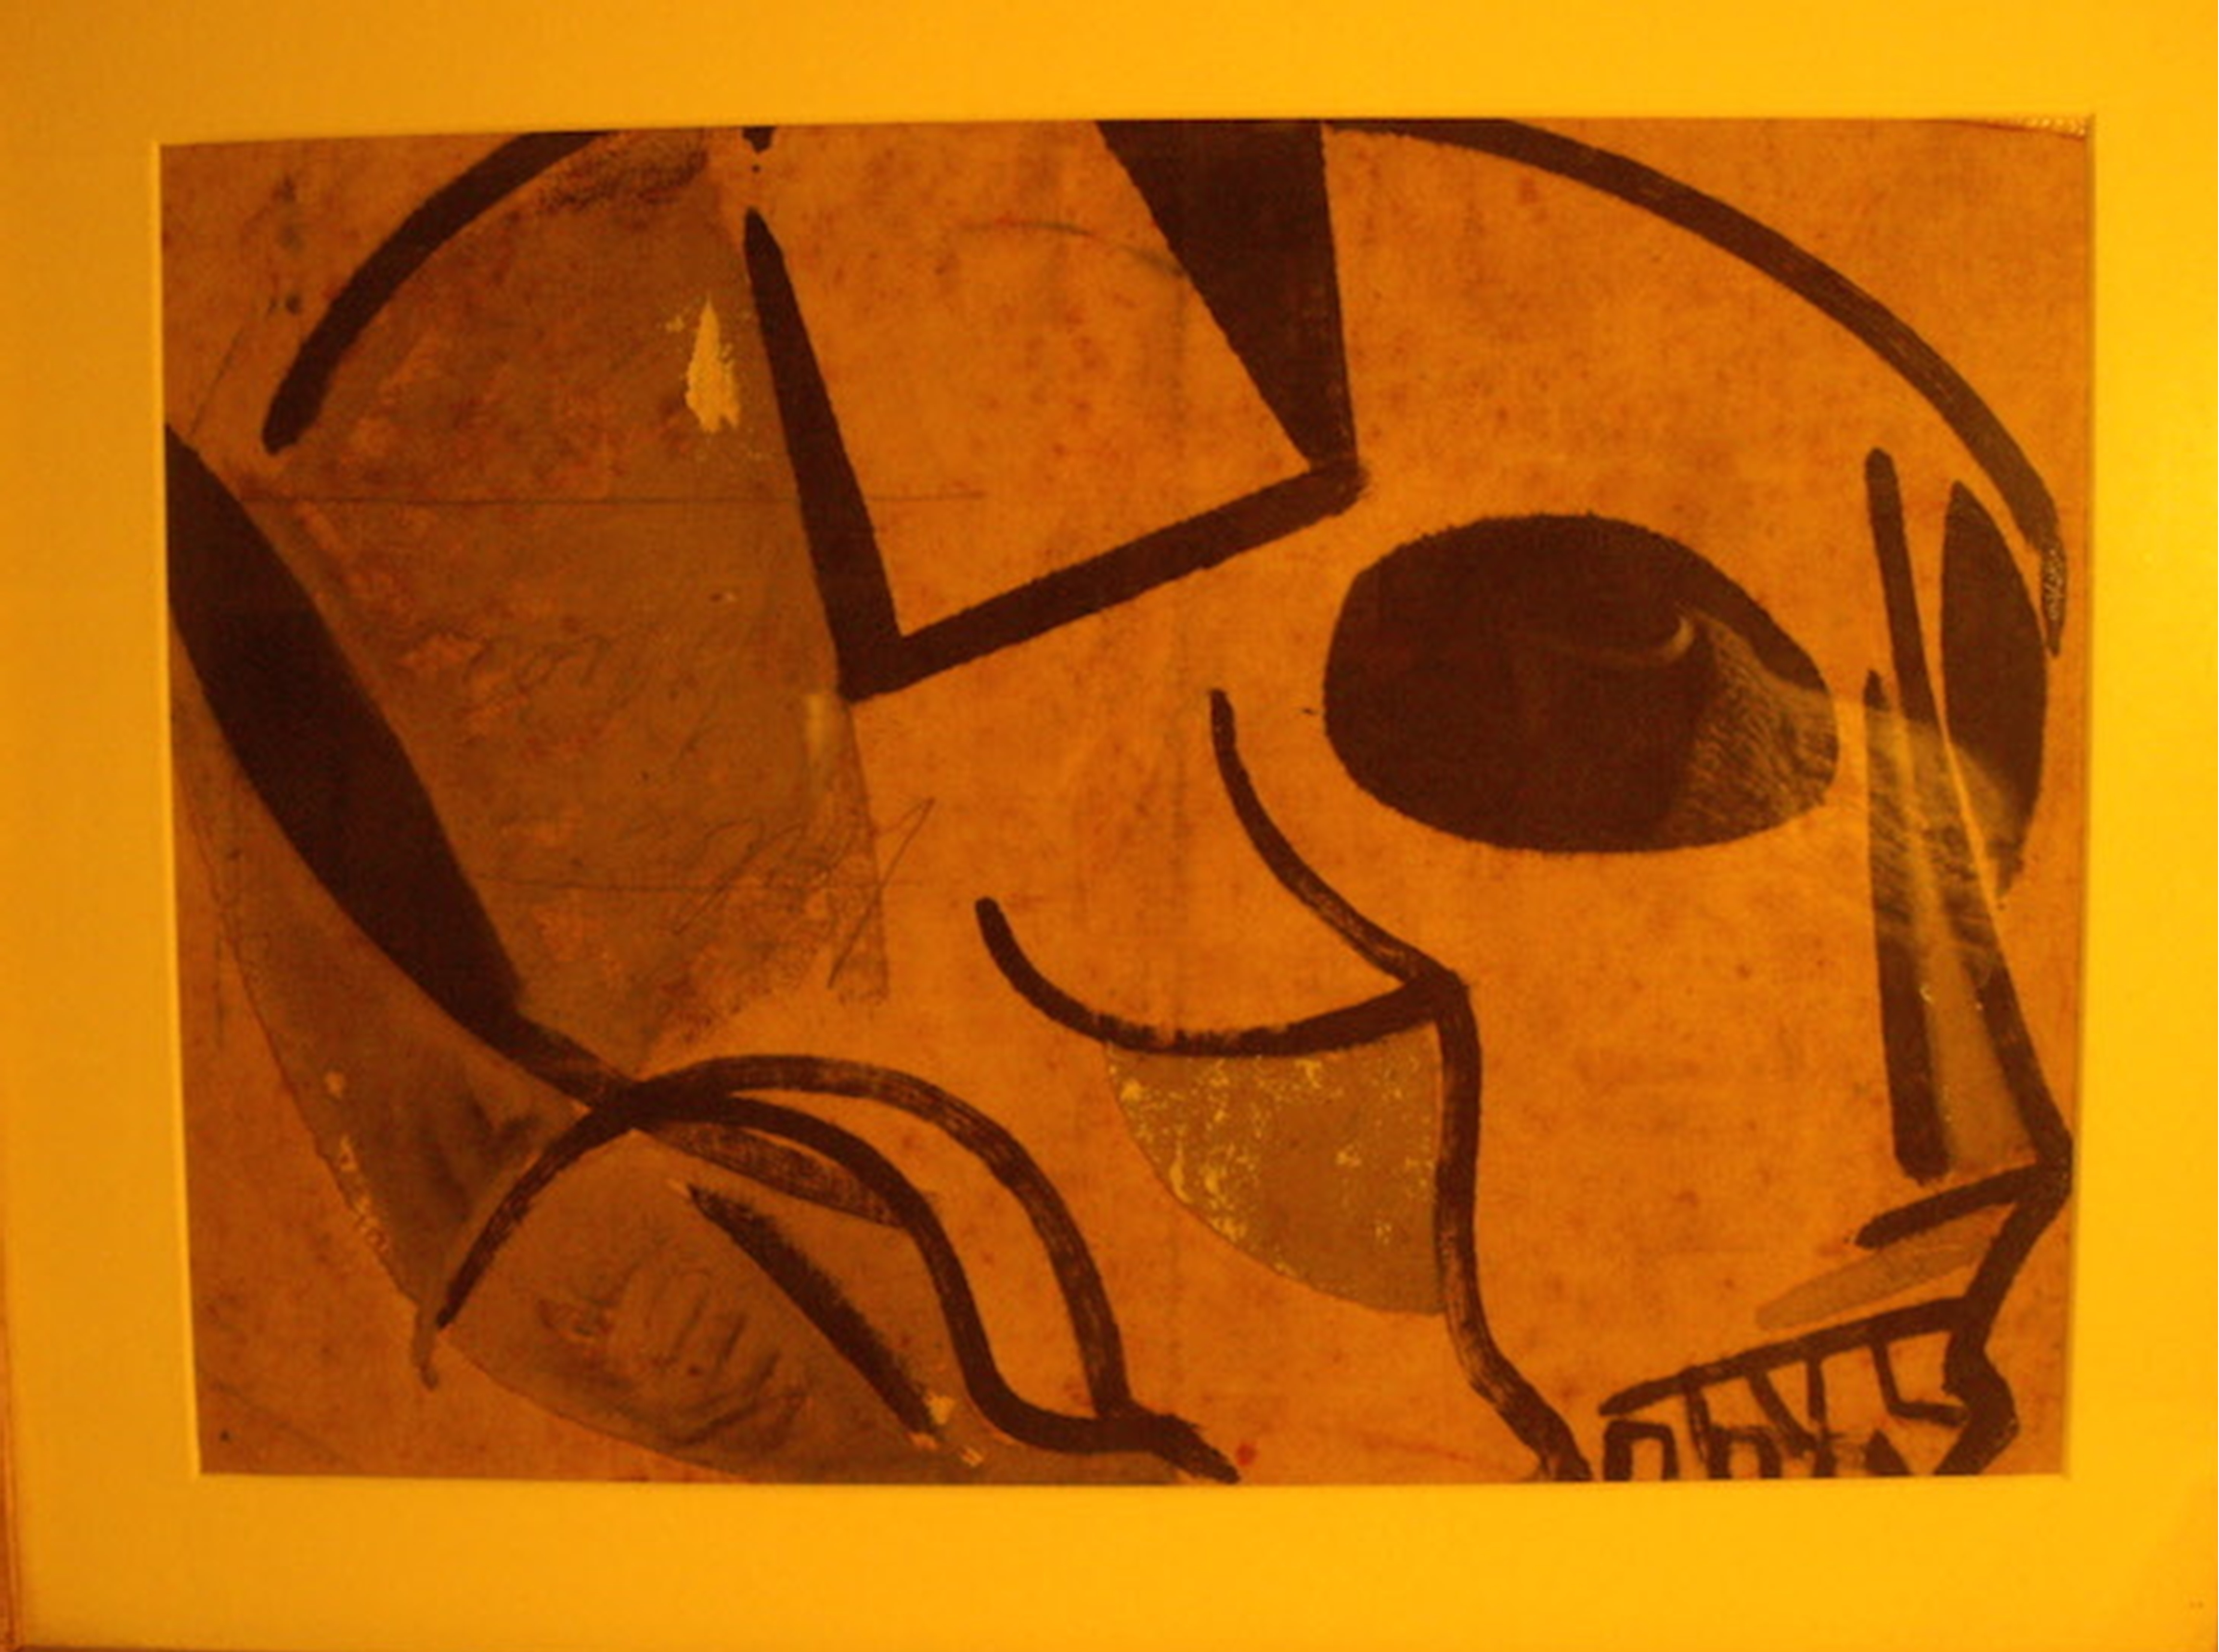 Crani, Josep Guinovart, 1953